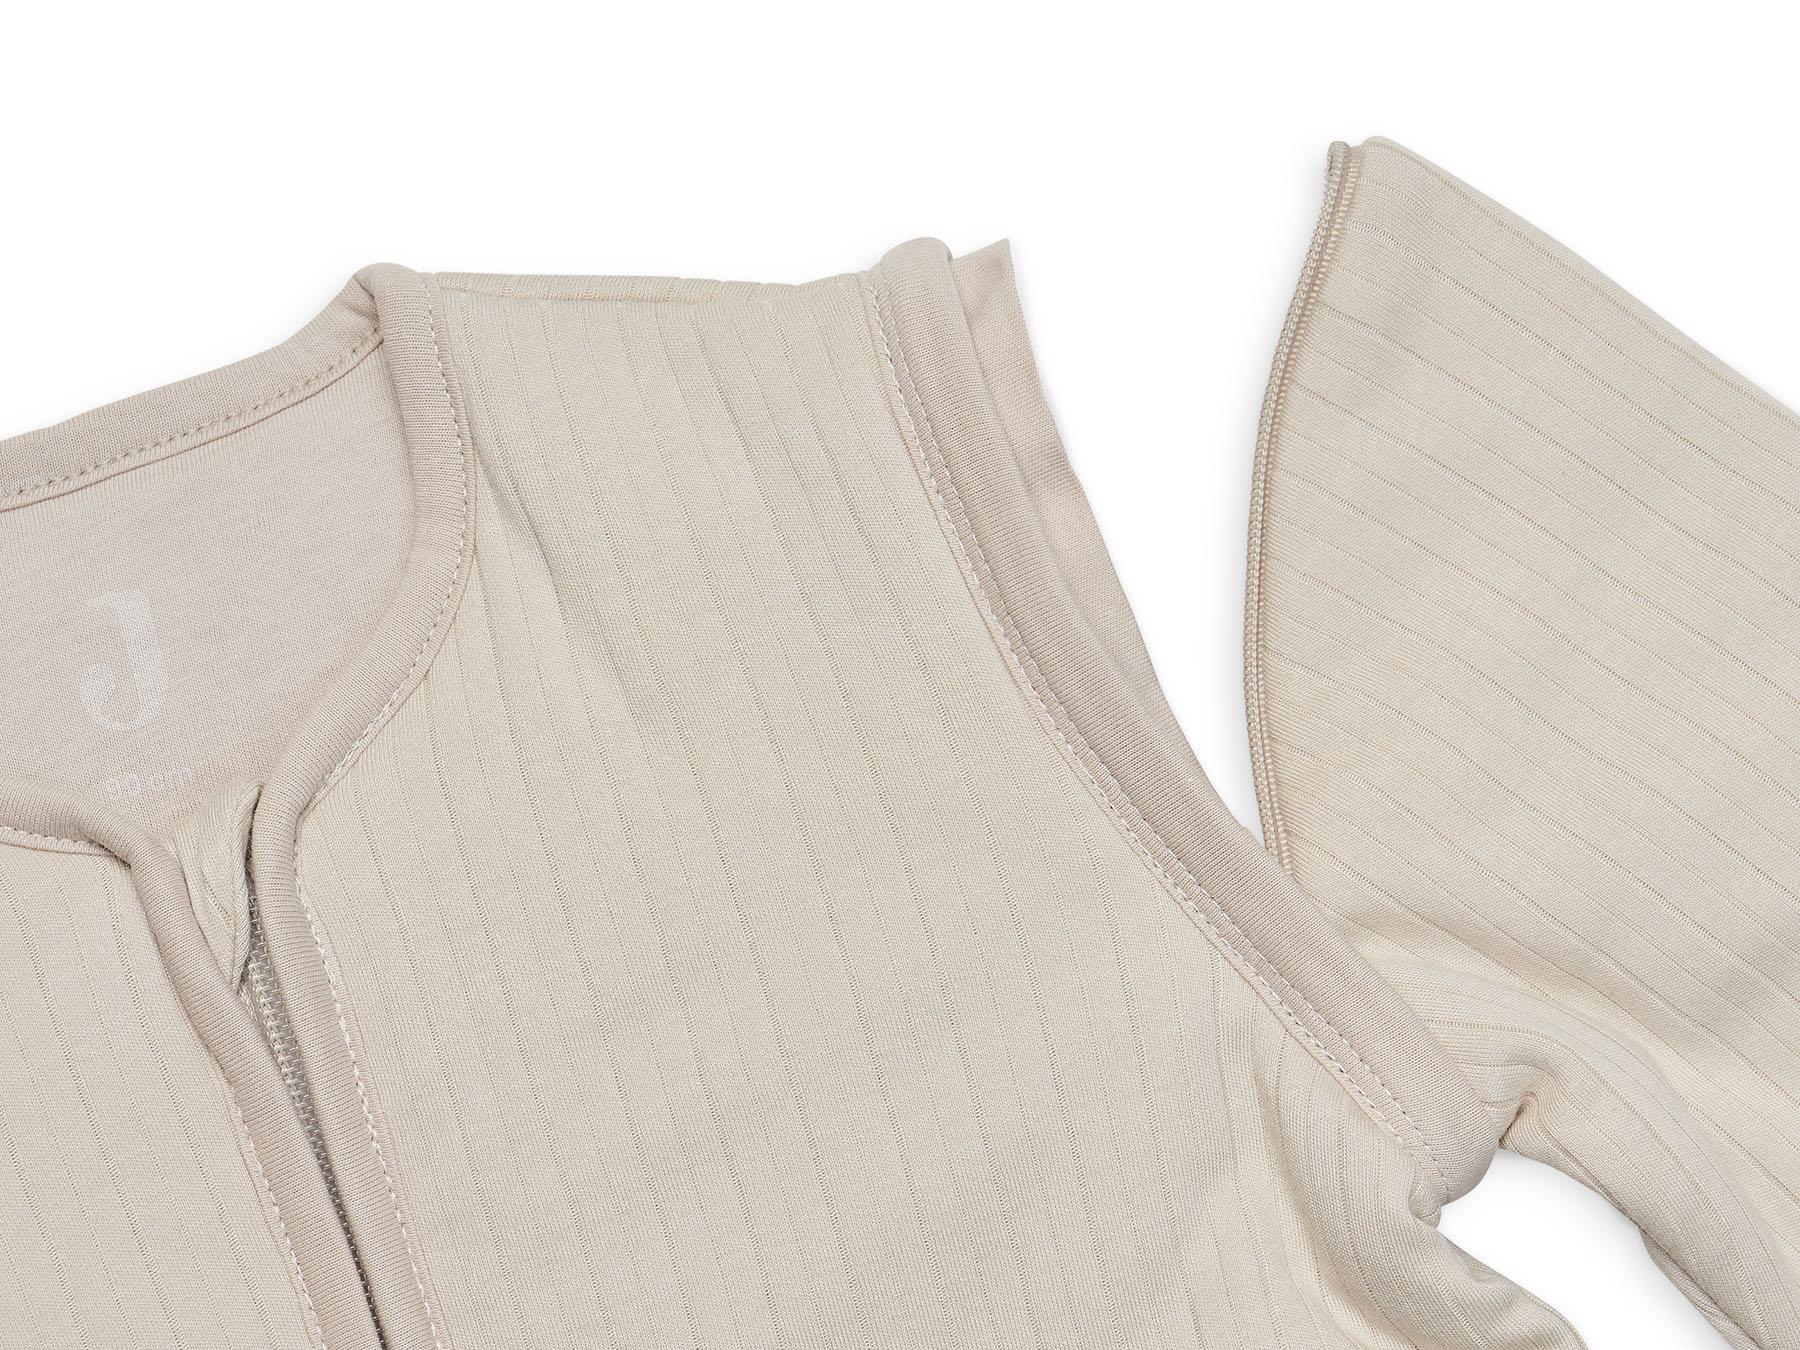 Afbeelding Jollein slaapzak 110cm Basic Stripe I Nougat